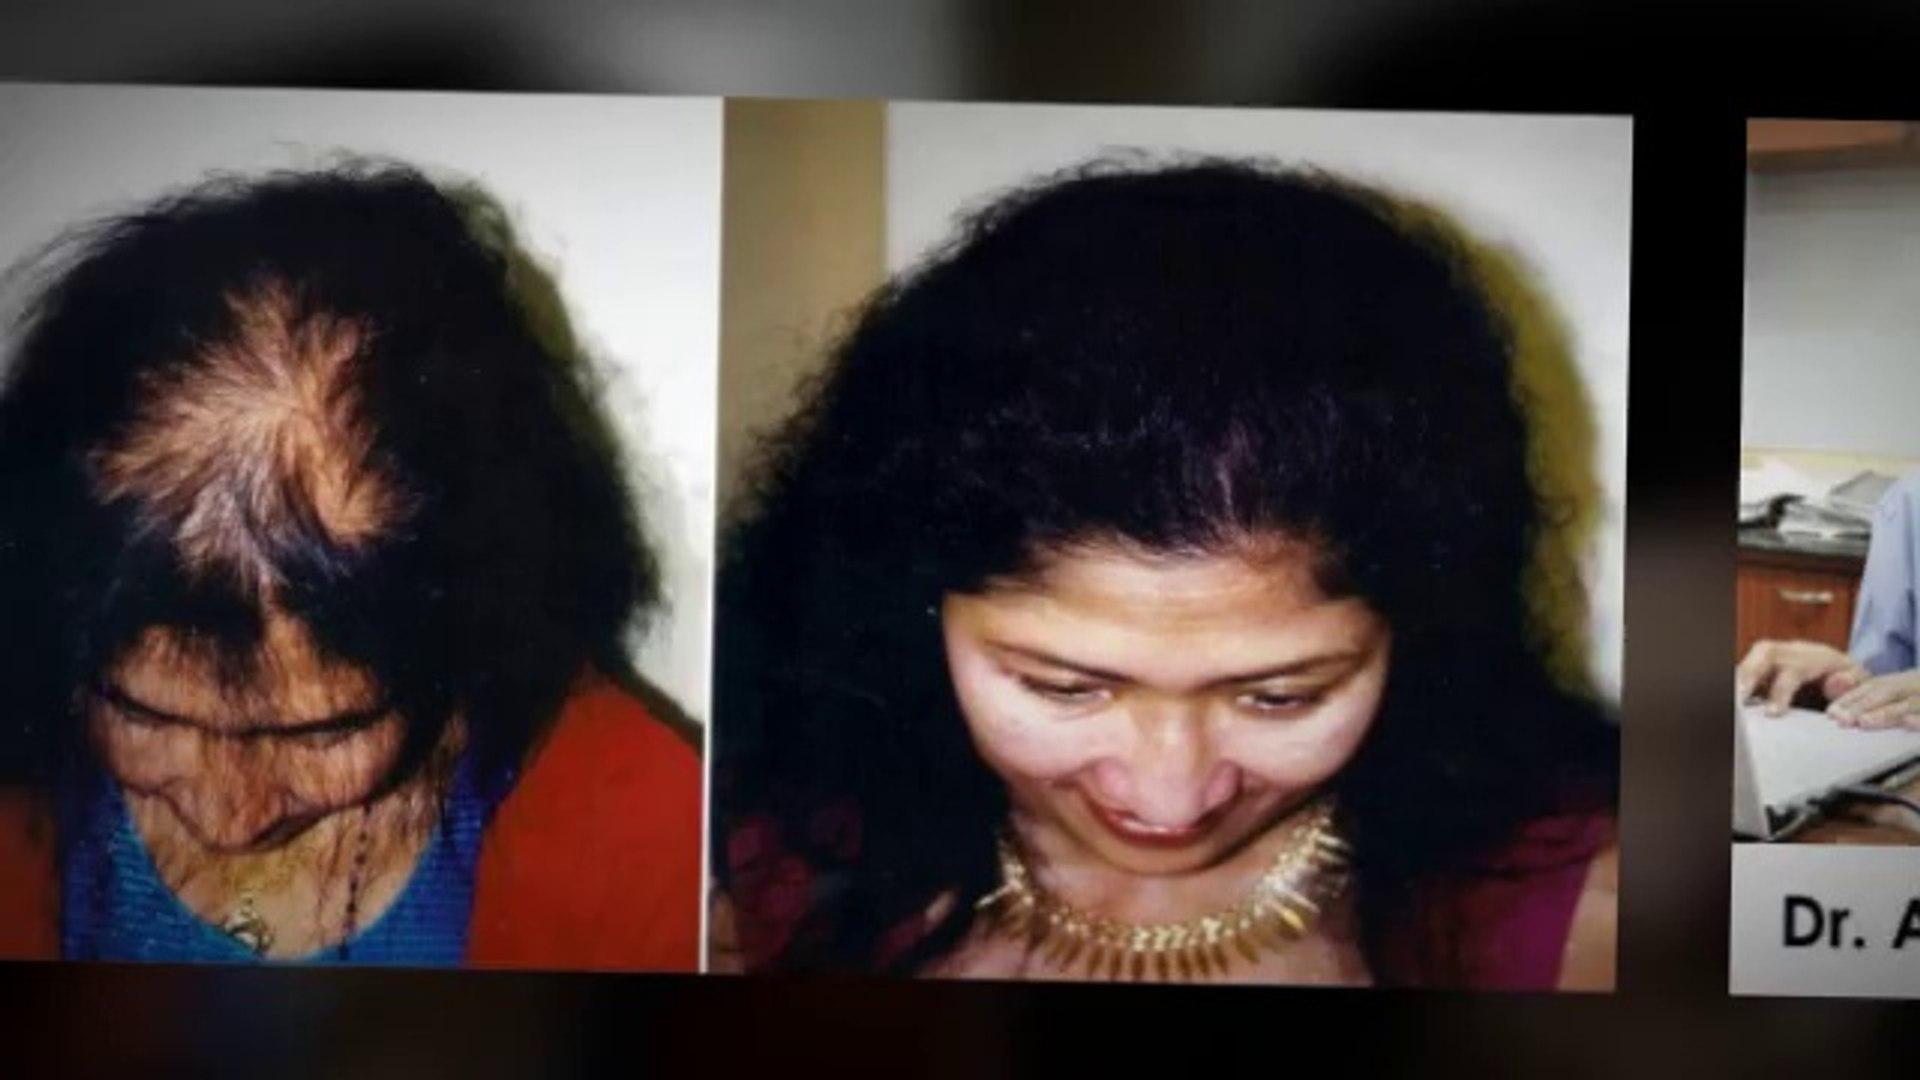 how to grow hair - how to reduce hair fall - how to stop hair fall - hair Transplant Chennai - Dr. A